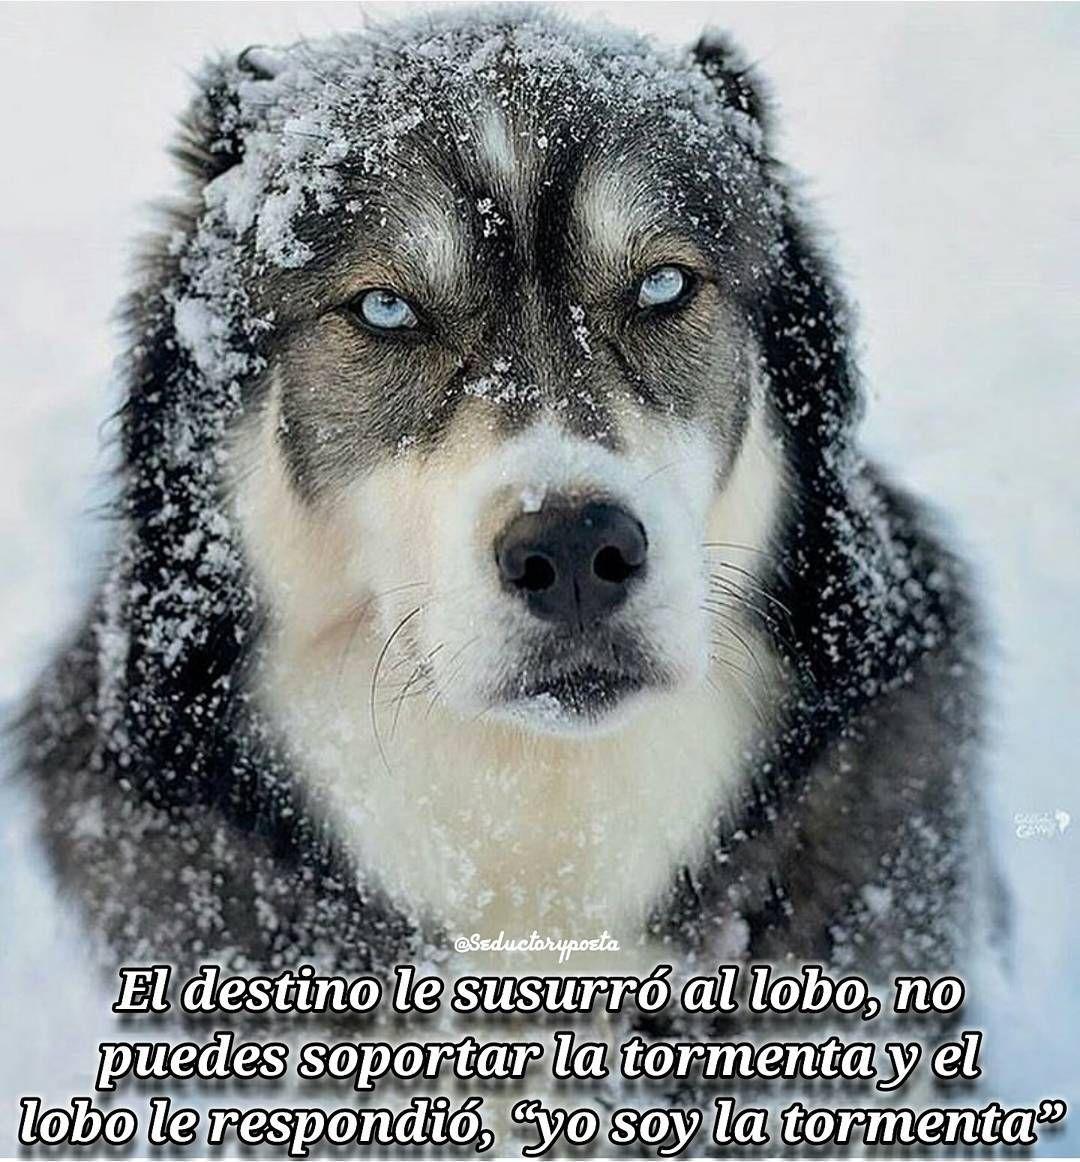 Yo soy la tormenta no le temo a nada ni a nadie mi